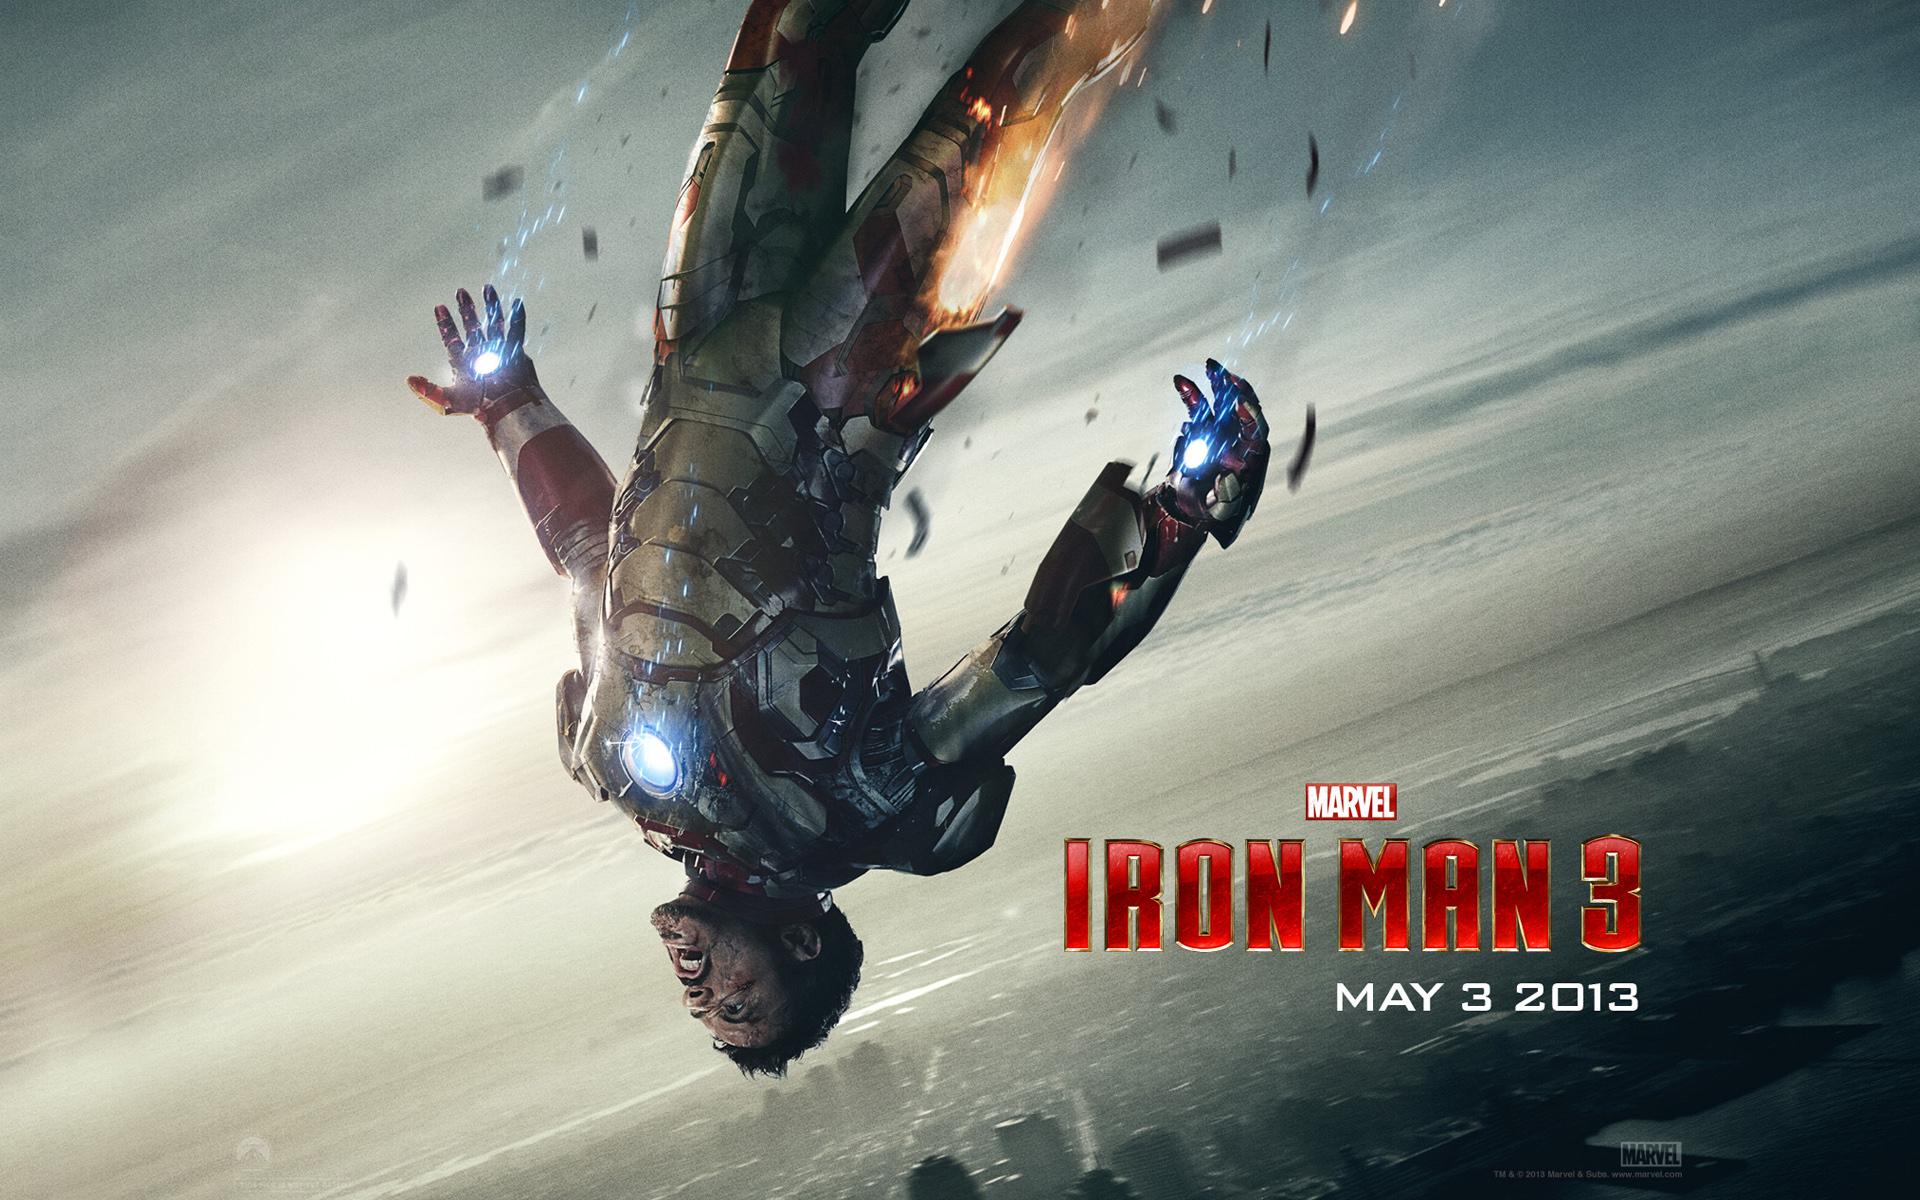 Tony Stark In Iron Man 3 Hd Wallpaper